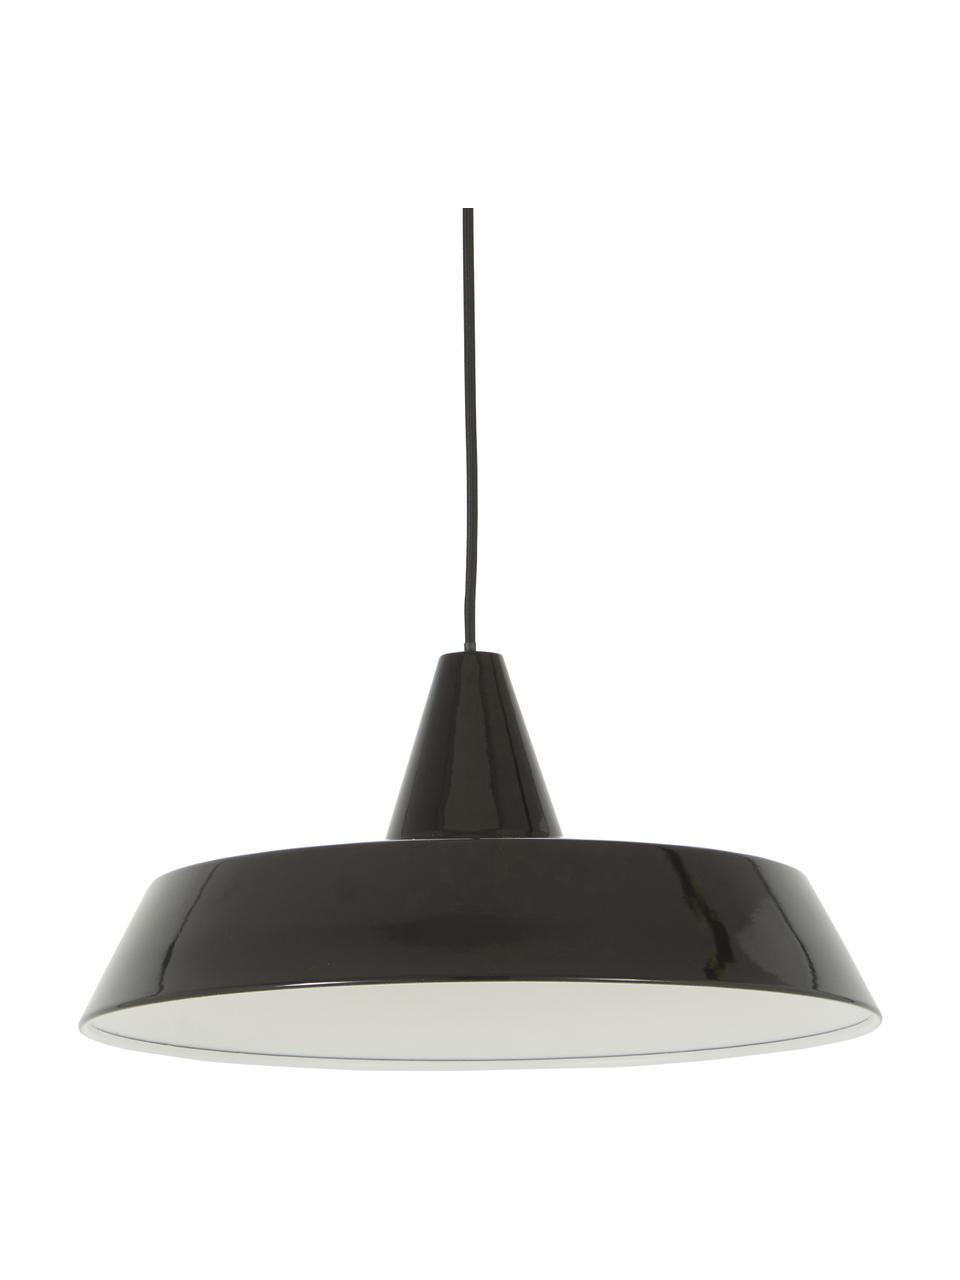 Lampa wisząca scandi Jubilee, Czarny, Ø 40 x W 20 cm